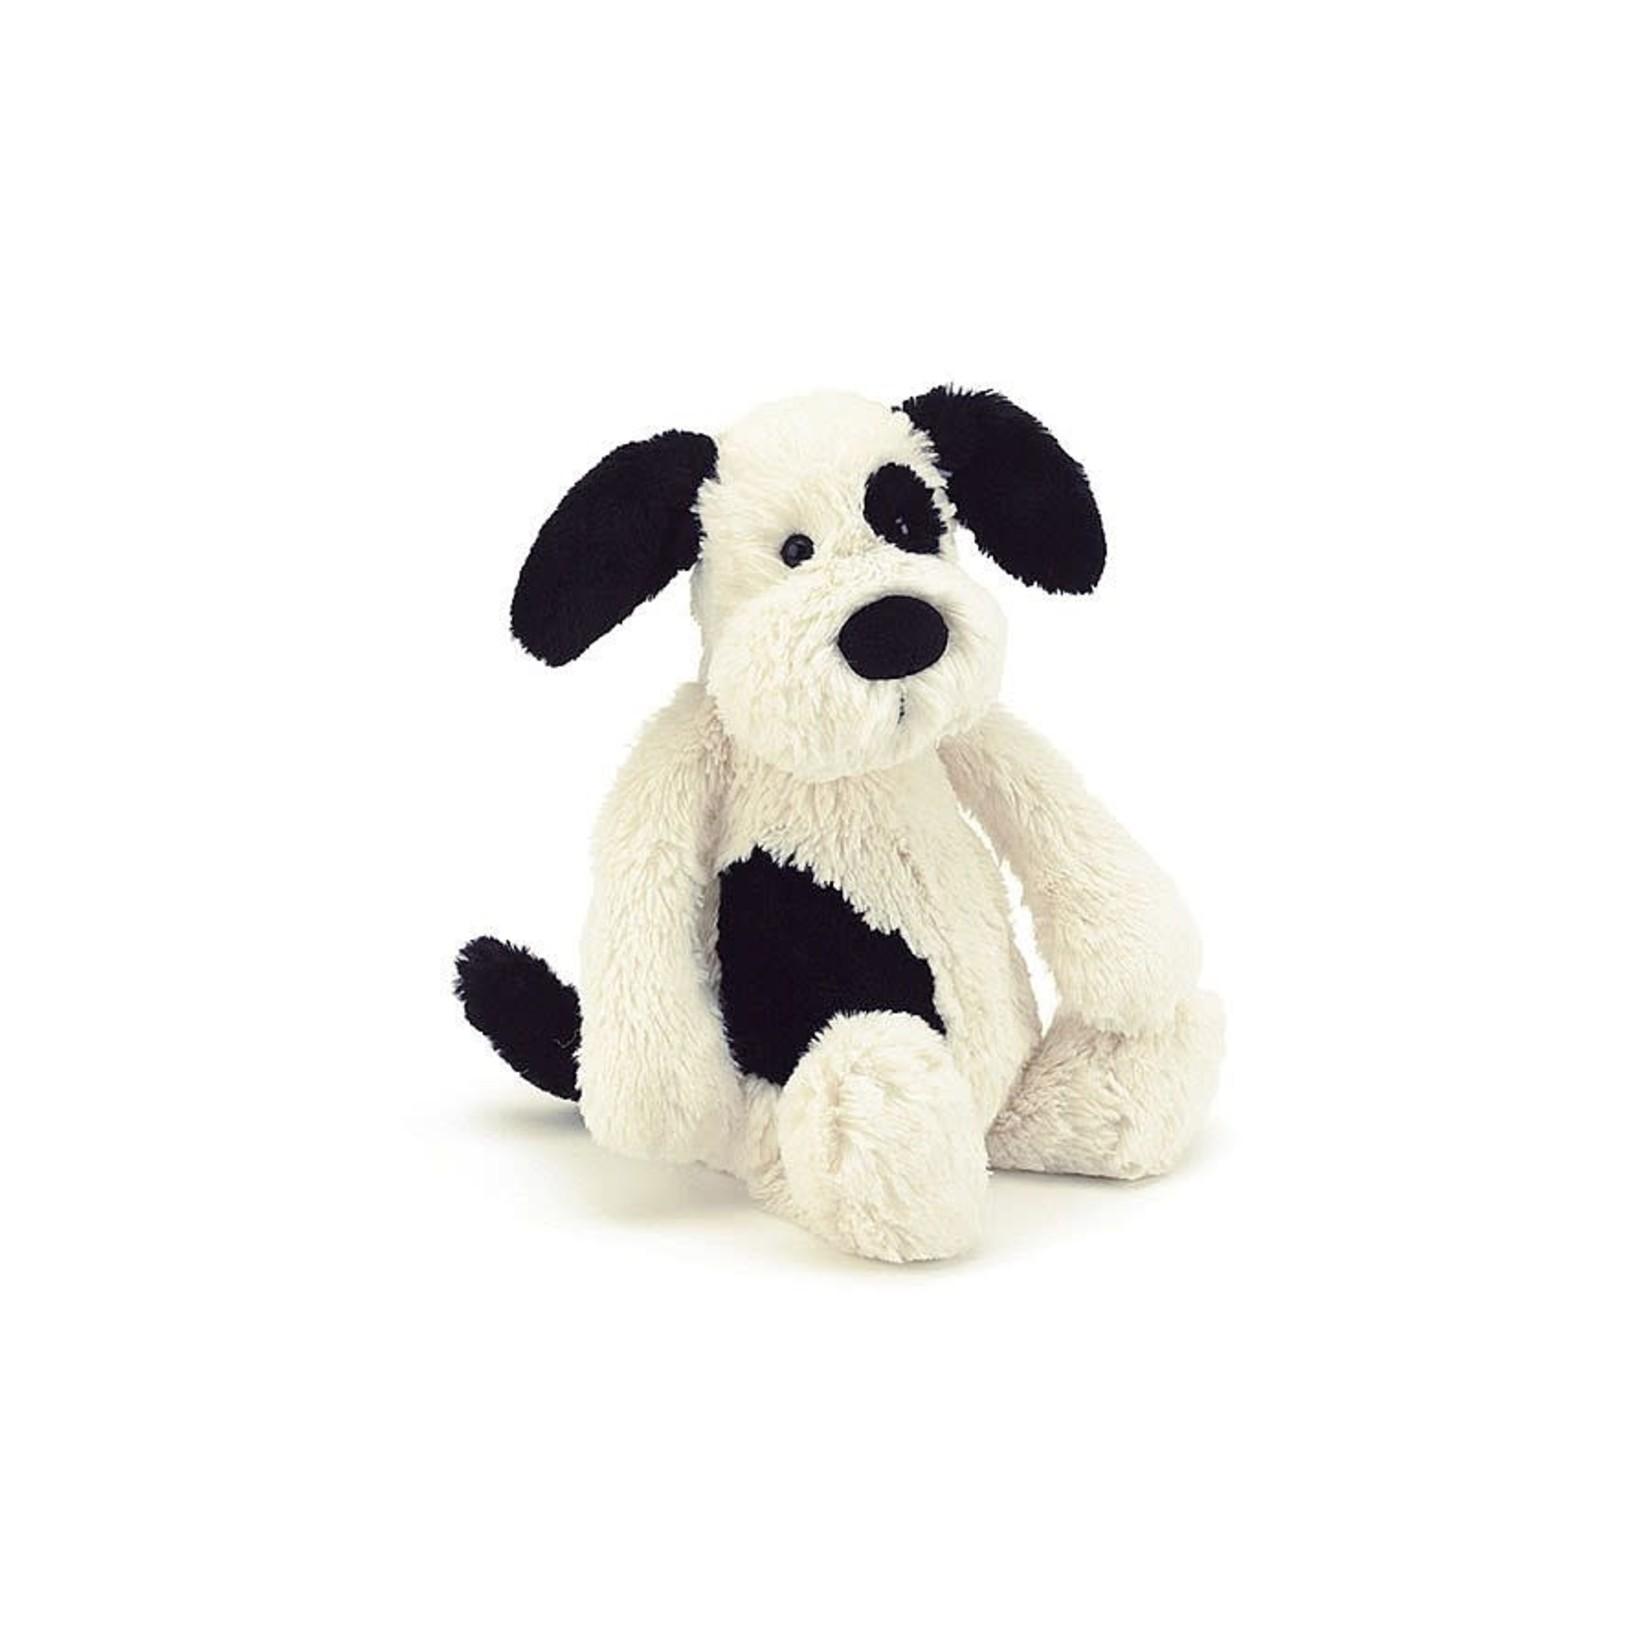 Jellycat Bashful Blk/Crm Puppy Md